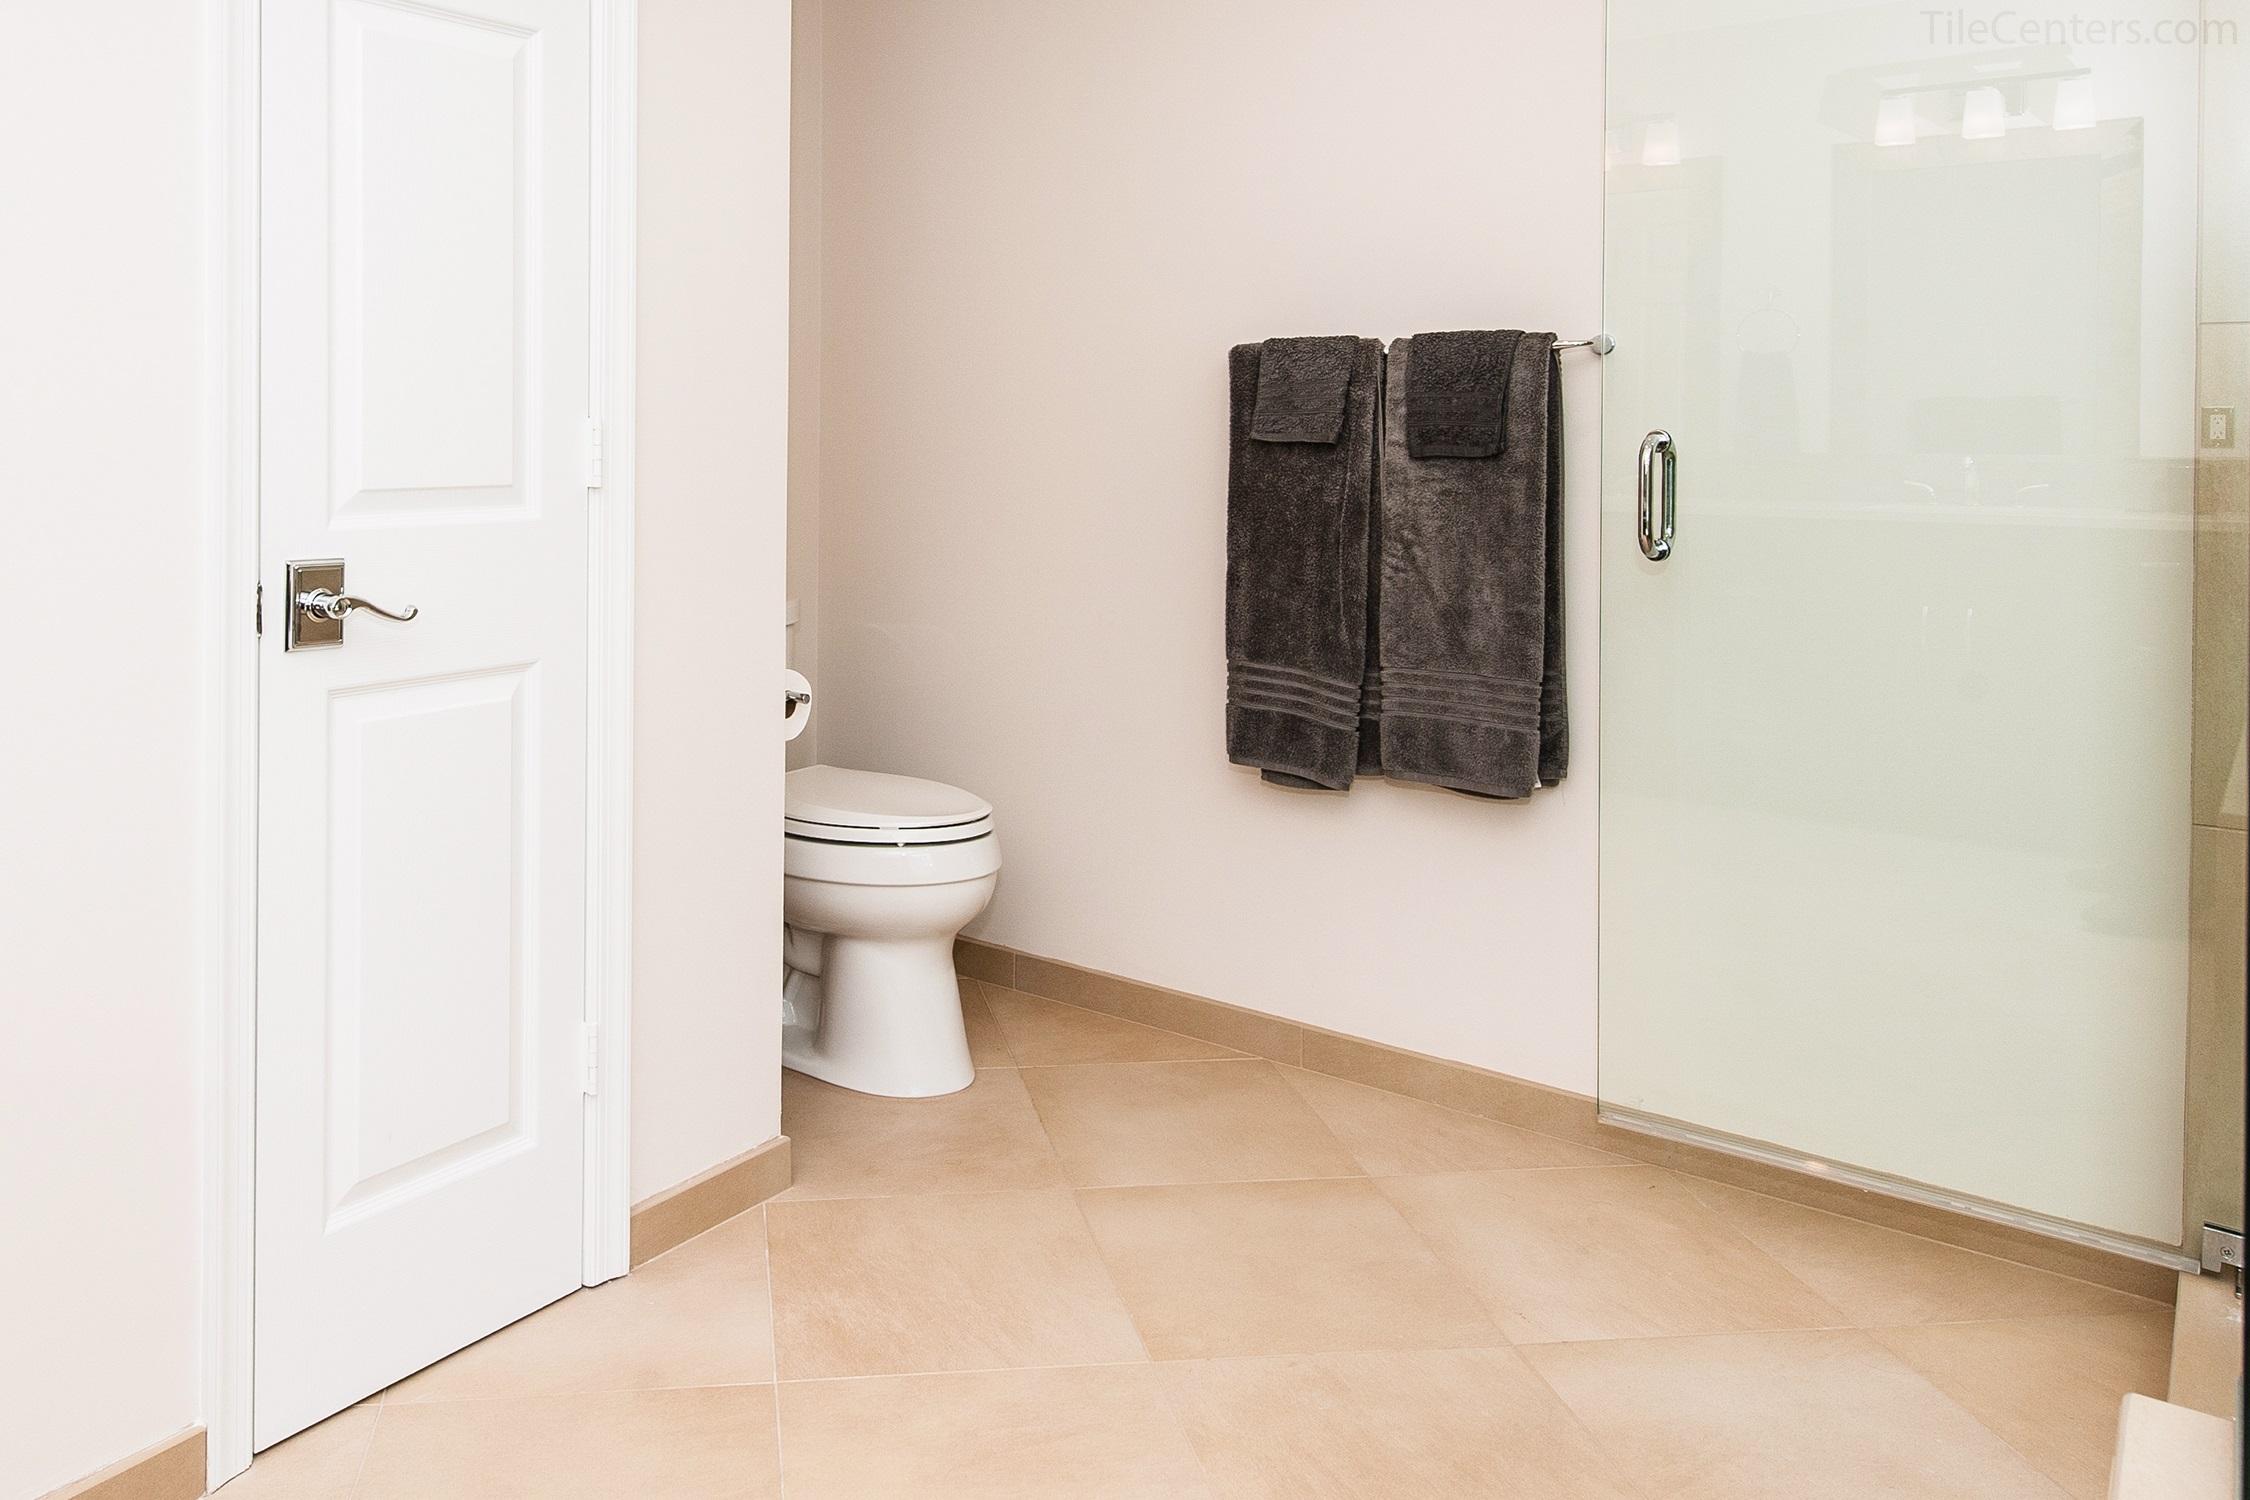 Transitional Bathroom Remodel - Gaithersburg, MD